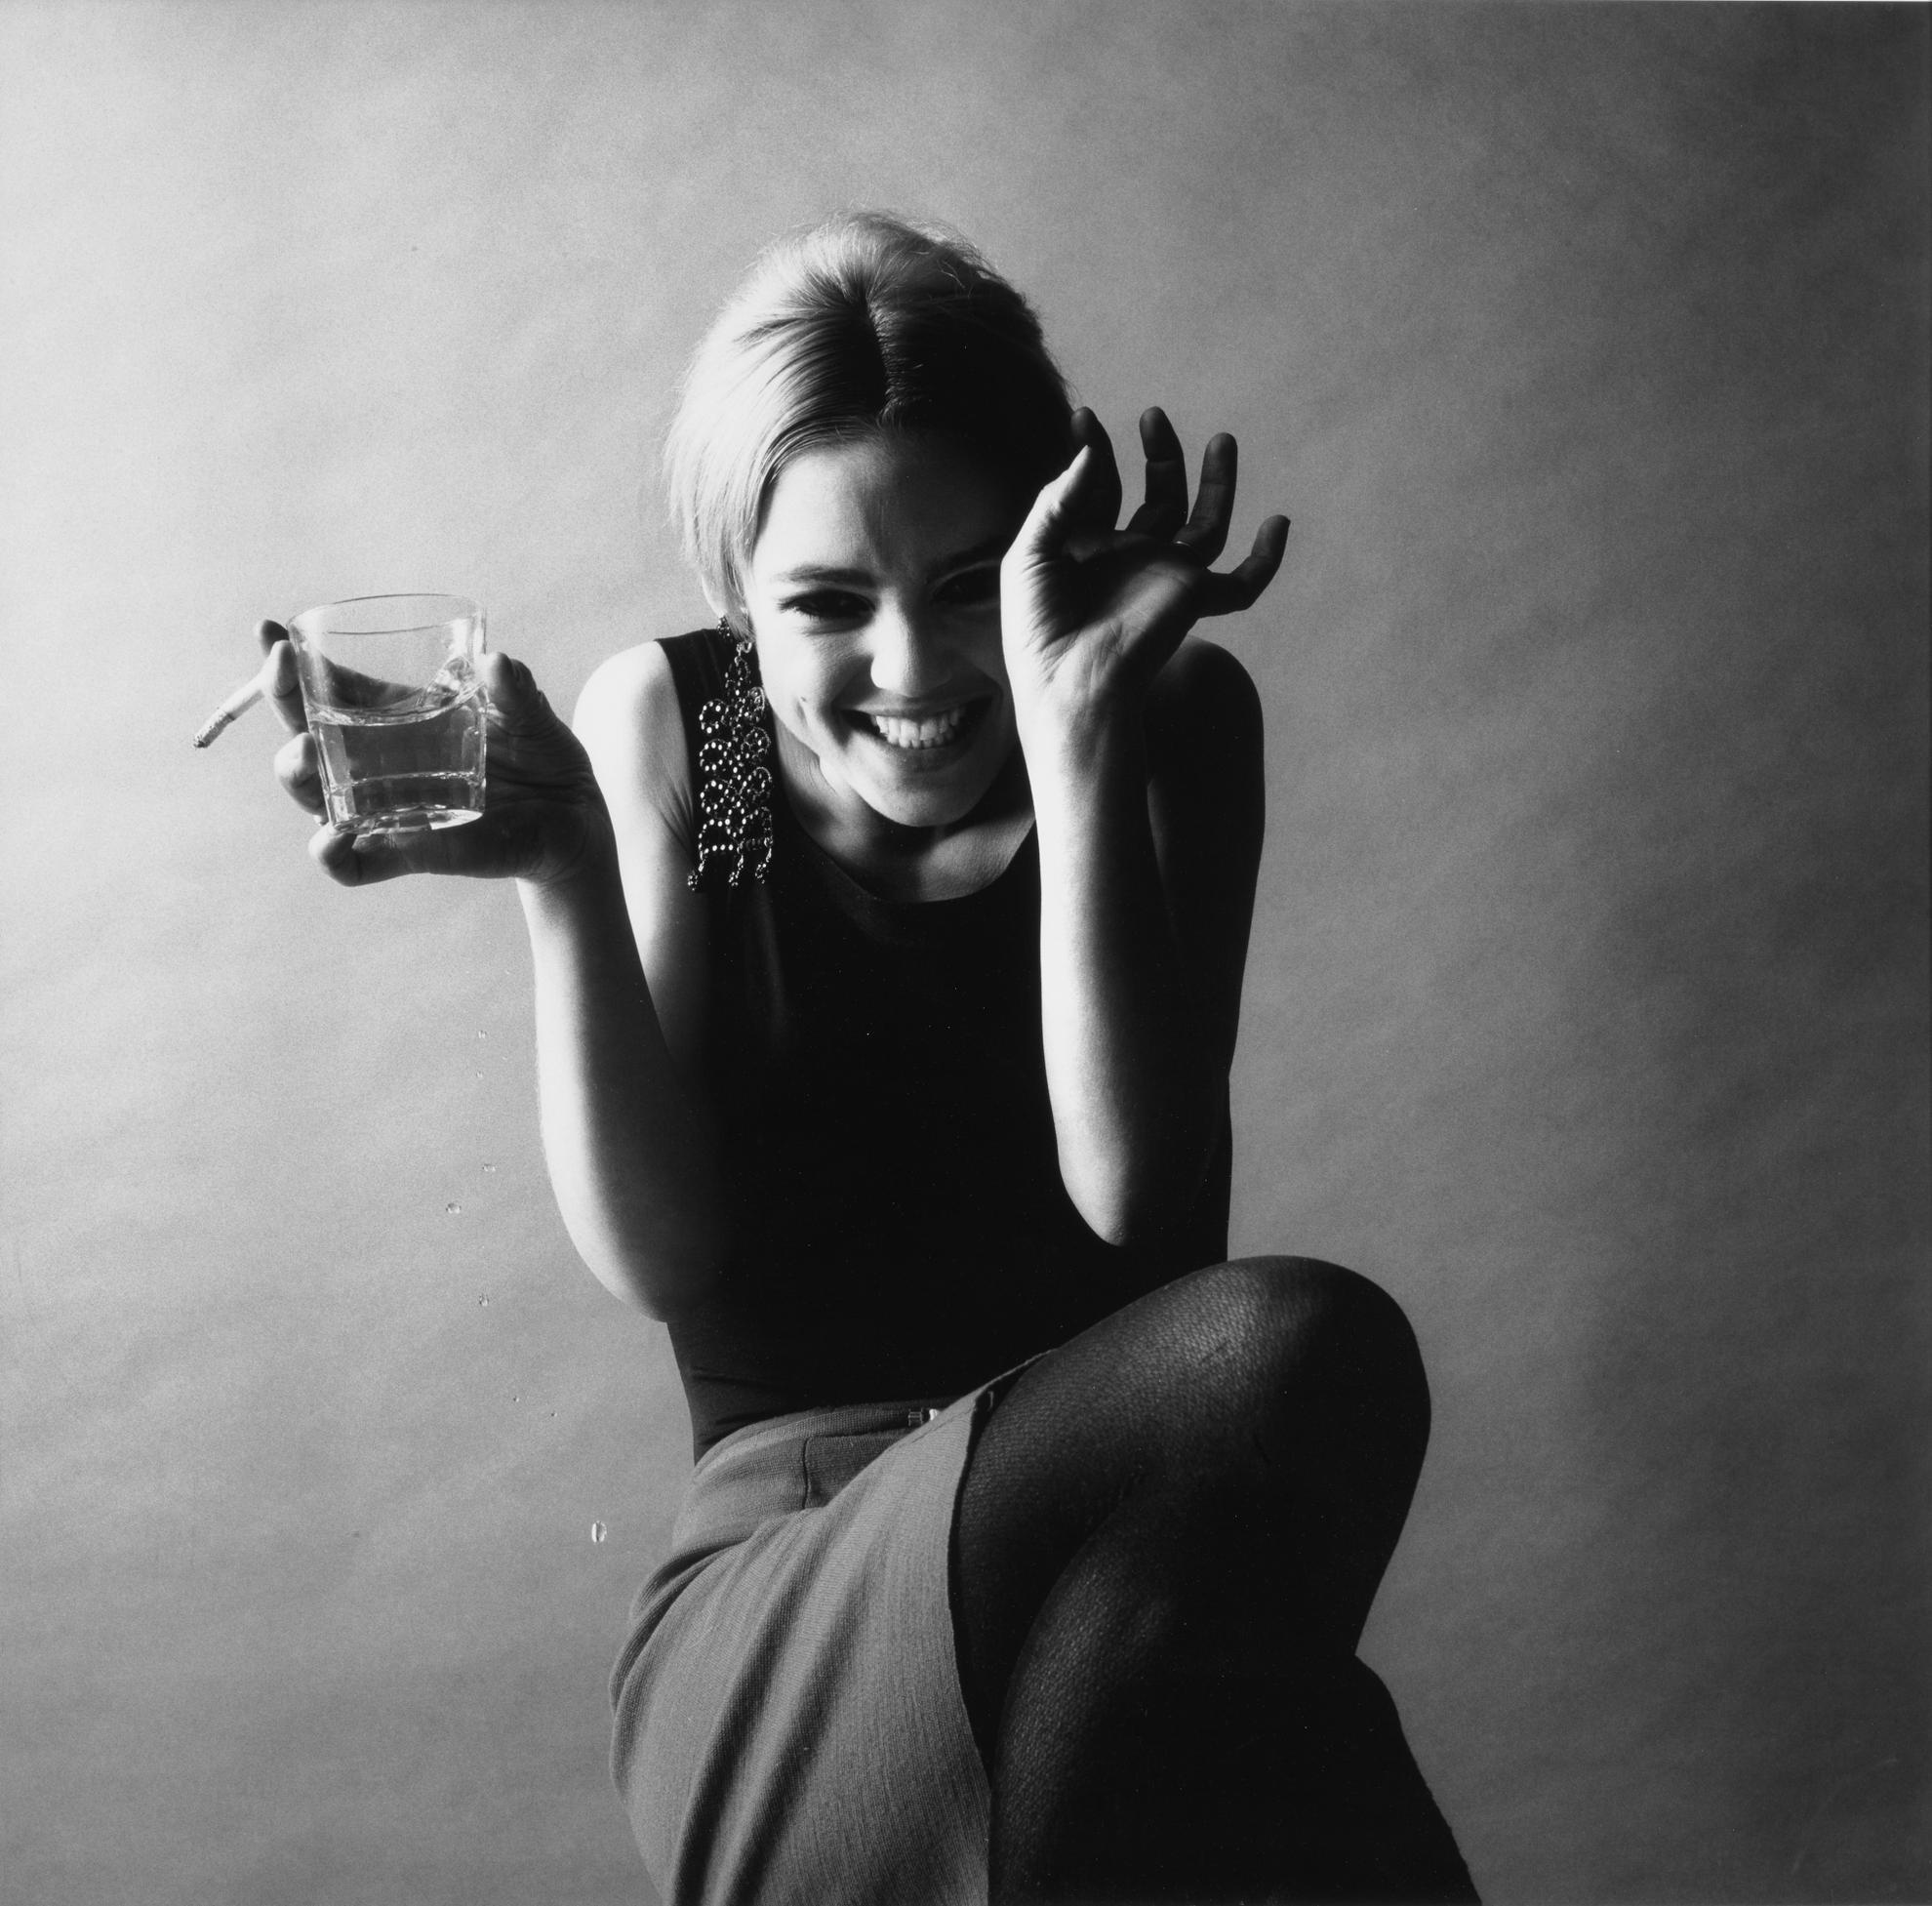 Jerry Schatzberg-Edie Sedgwick Super Star-1966